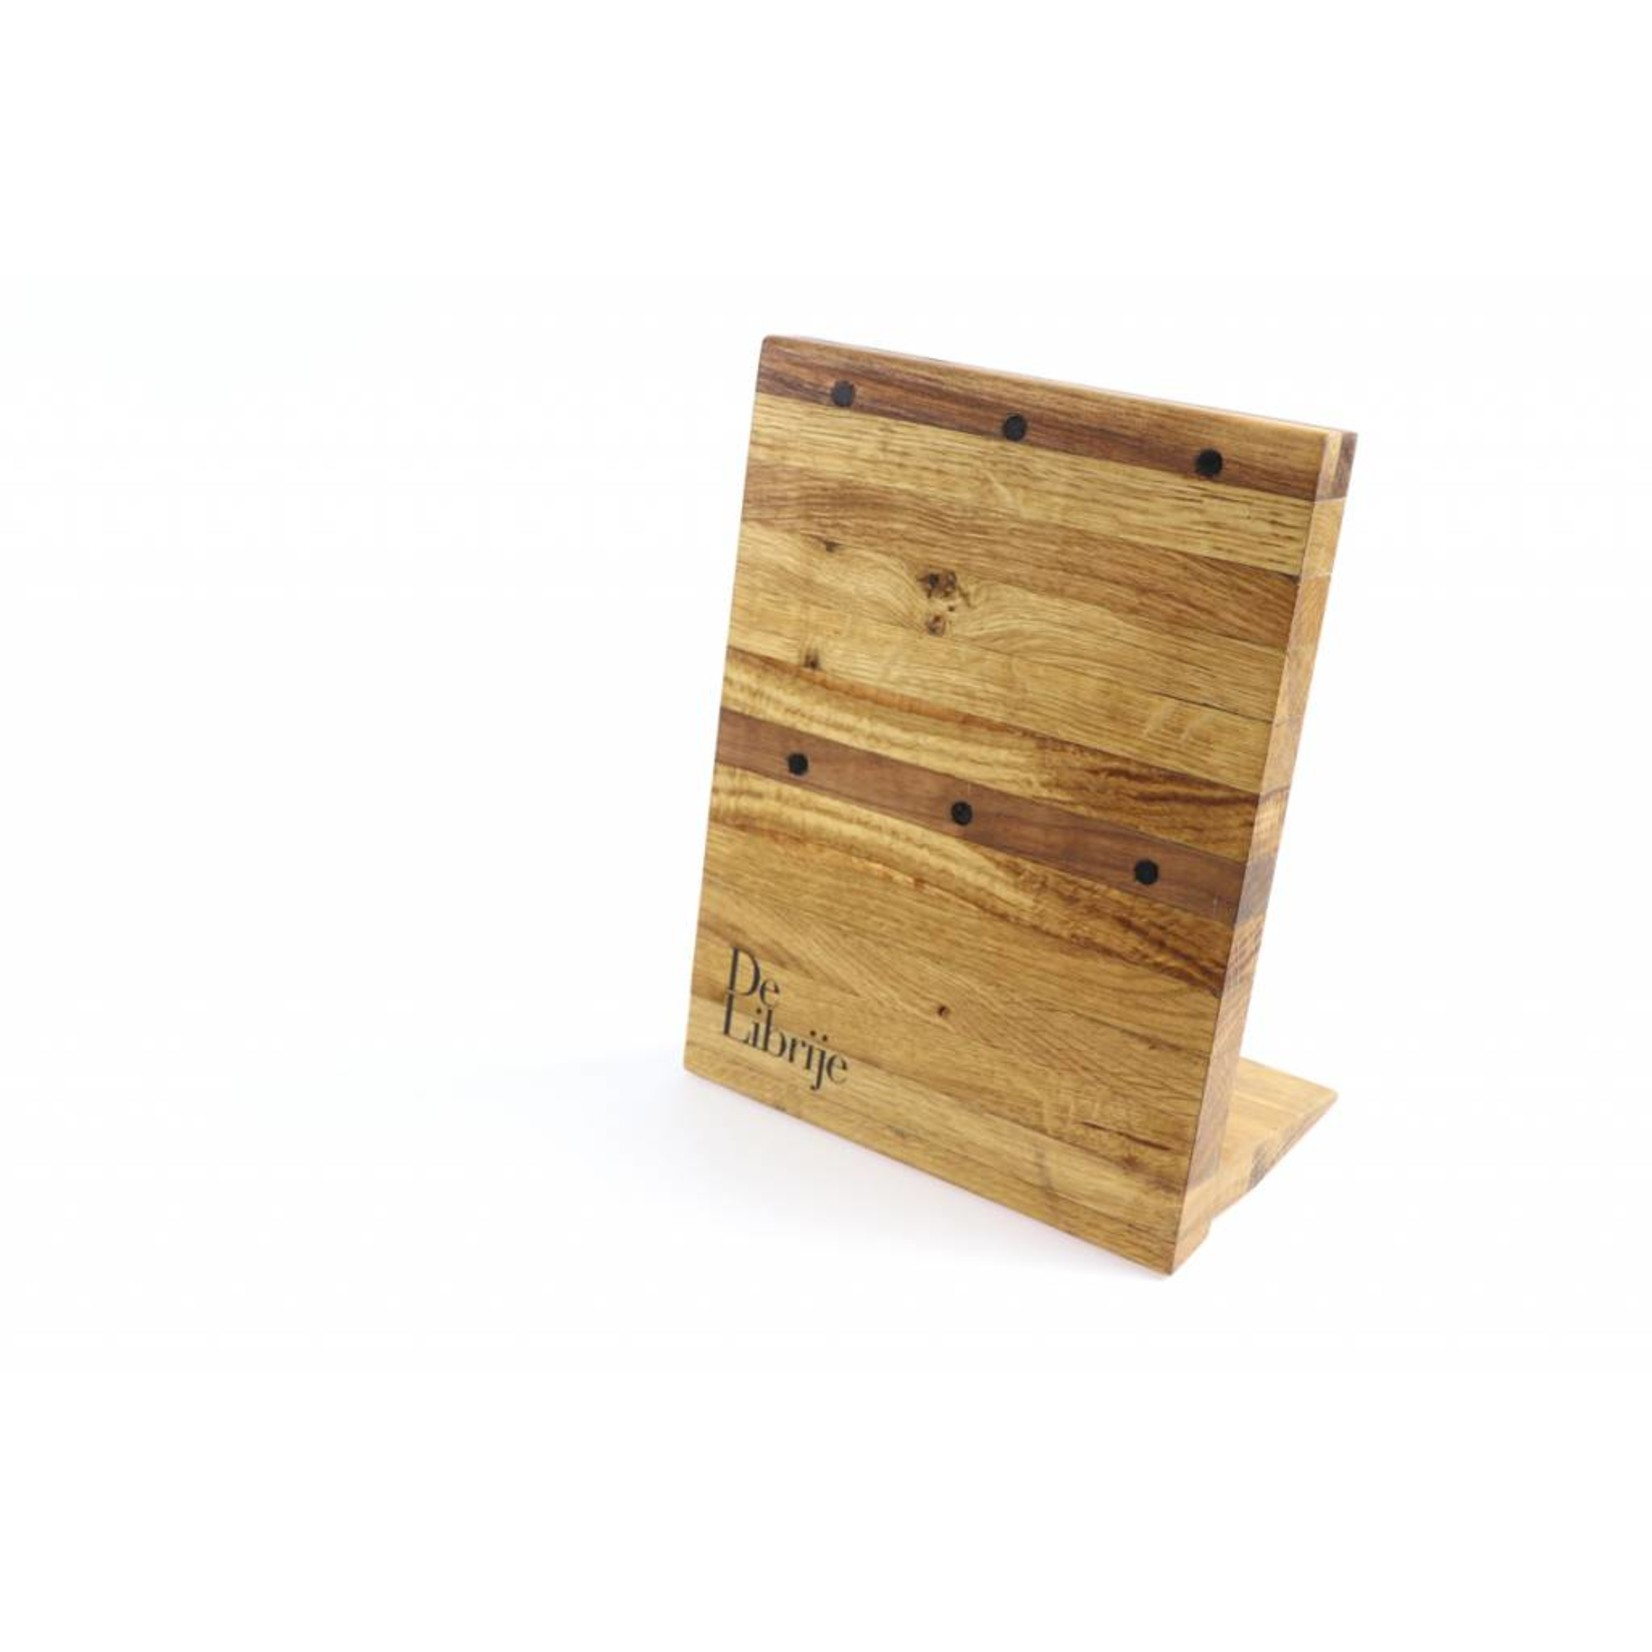 RYUSEN De Librije magnet knife holder in oak for 3 items  ( no knives )